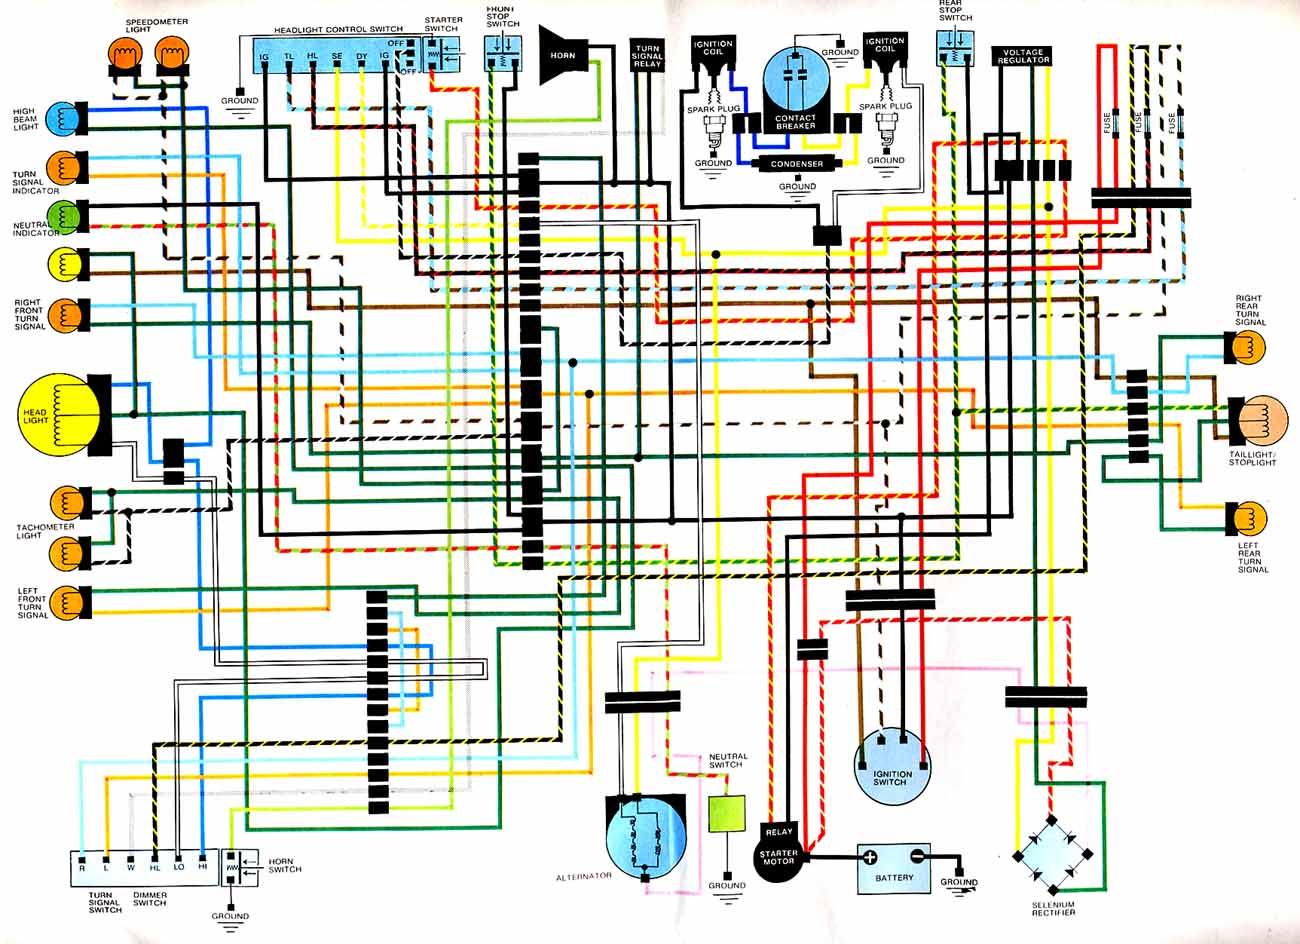 hight resolution of 1976 honda goldwing wiring diagram wiring library1976 honda cb360 wiringdiagram honda goldwing wiringdiagram